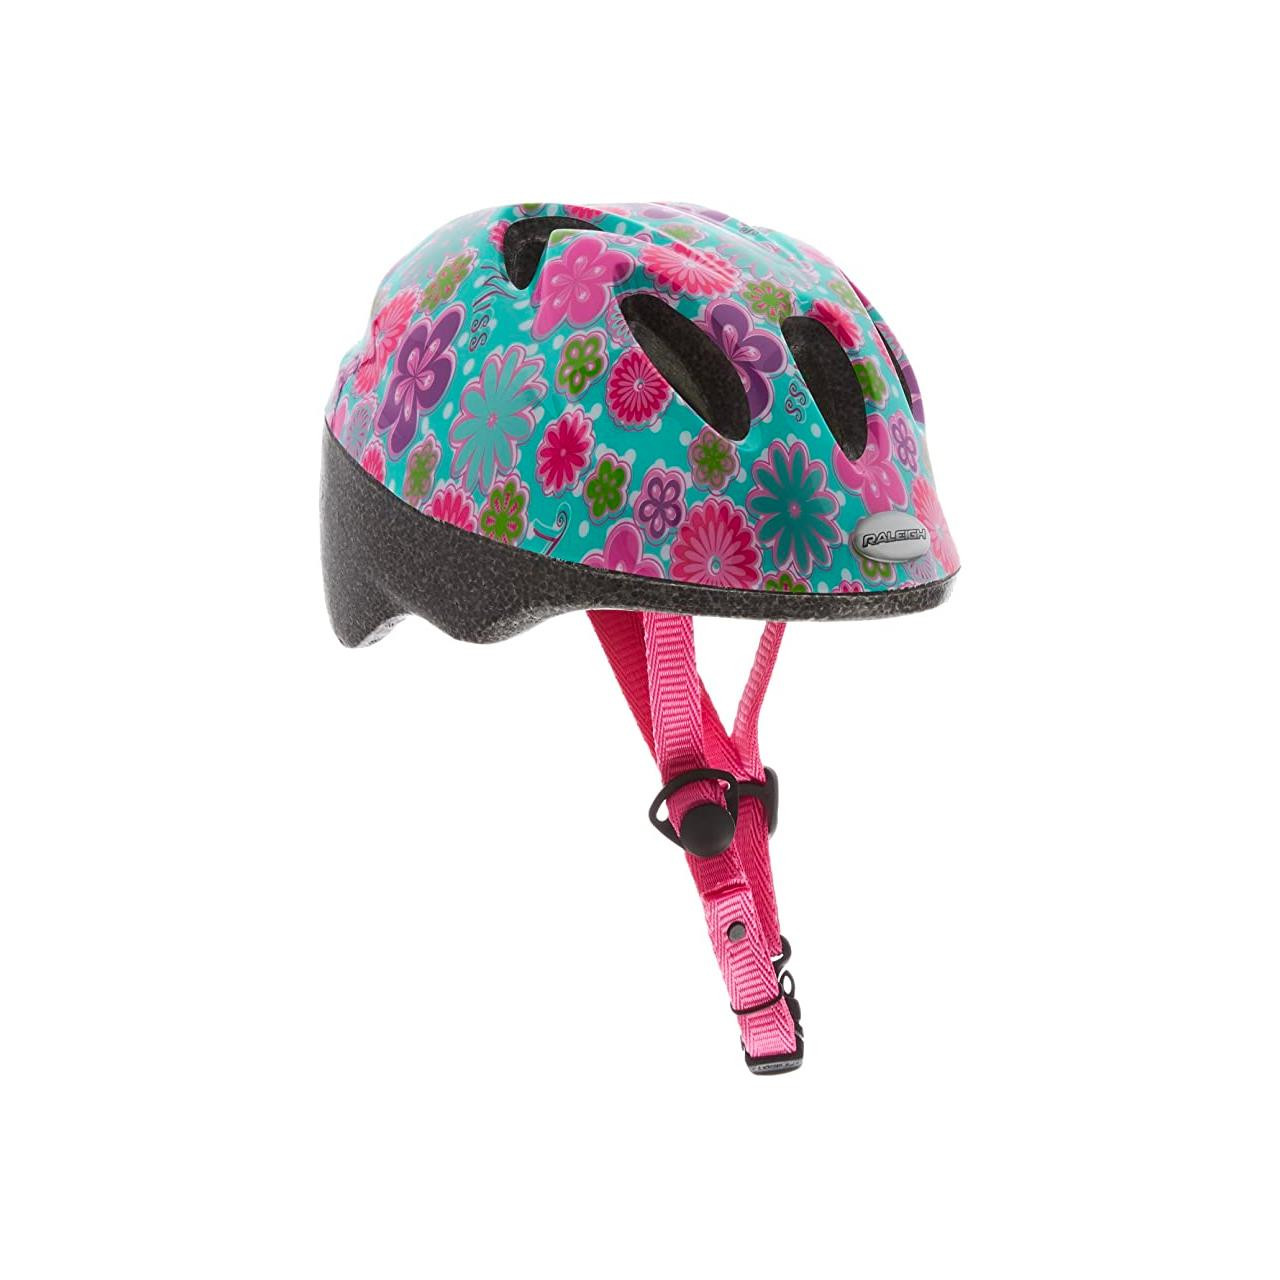 Raleigh Rascal Mini Miss Kids Cycle Helmet (44-50cm)